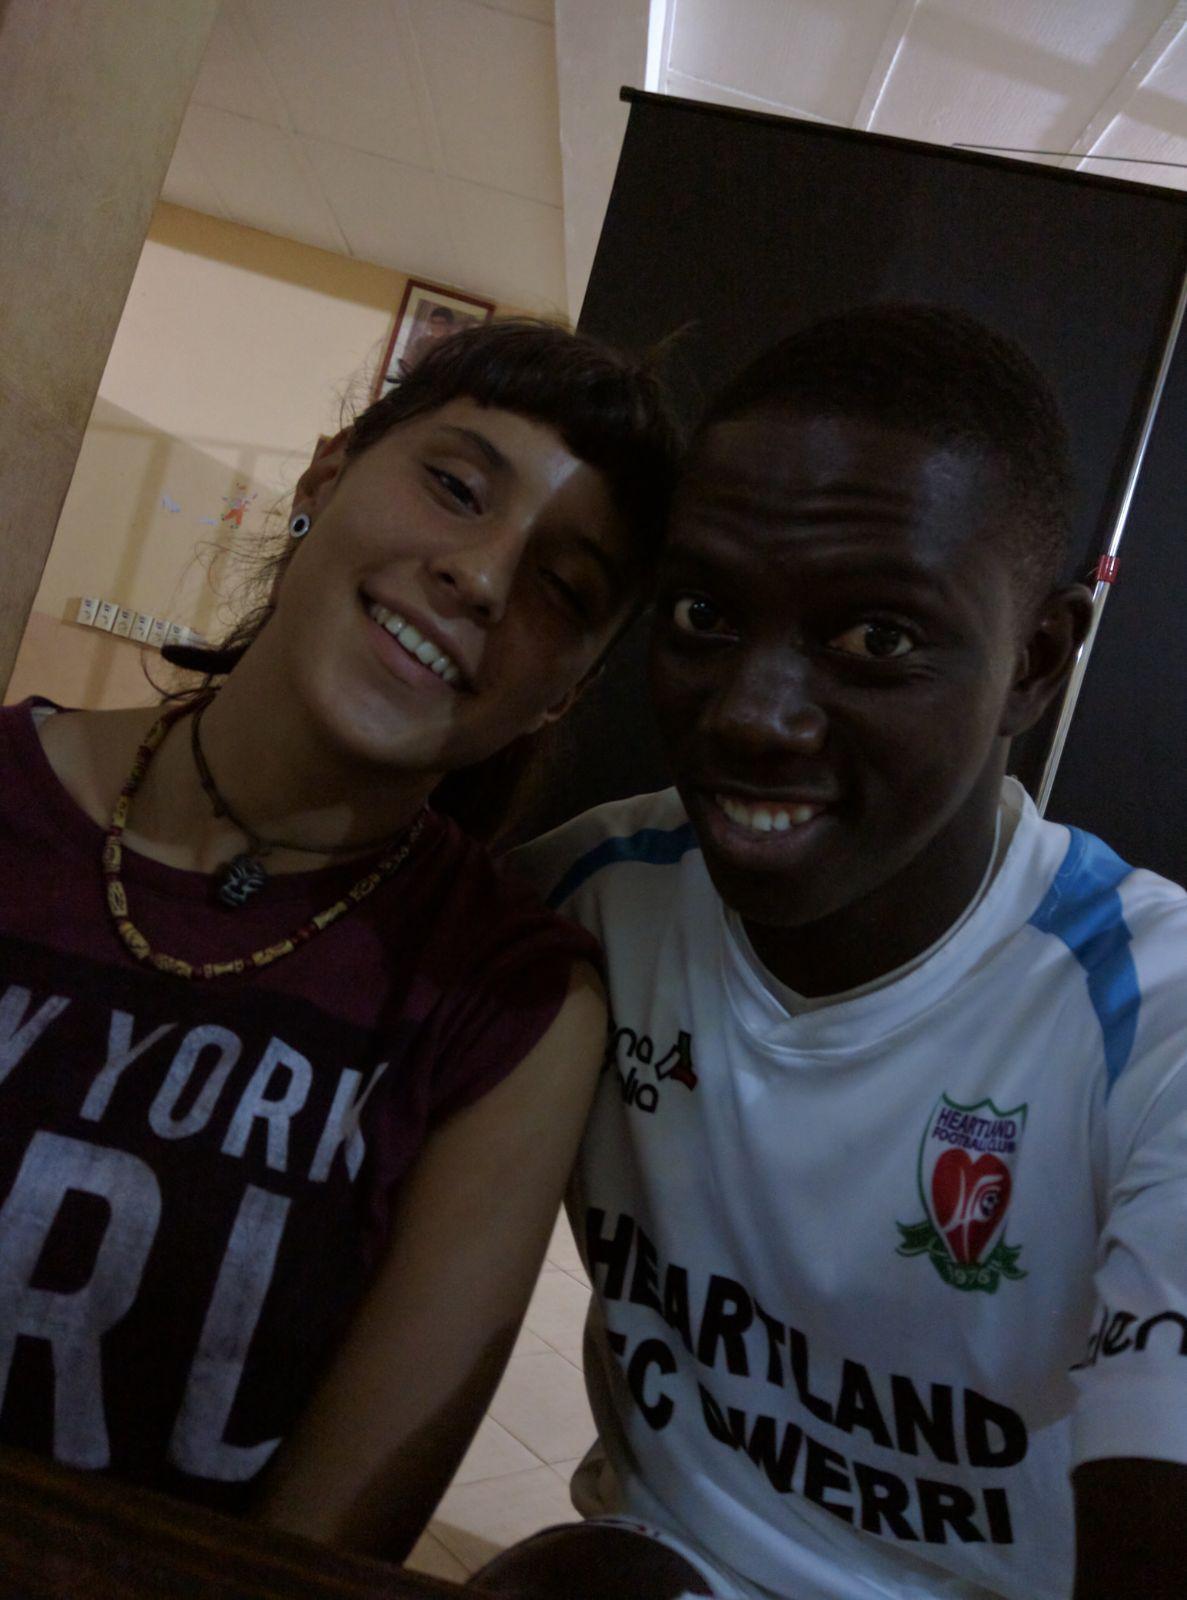 Carlotta-nigeria-sport